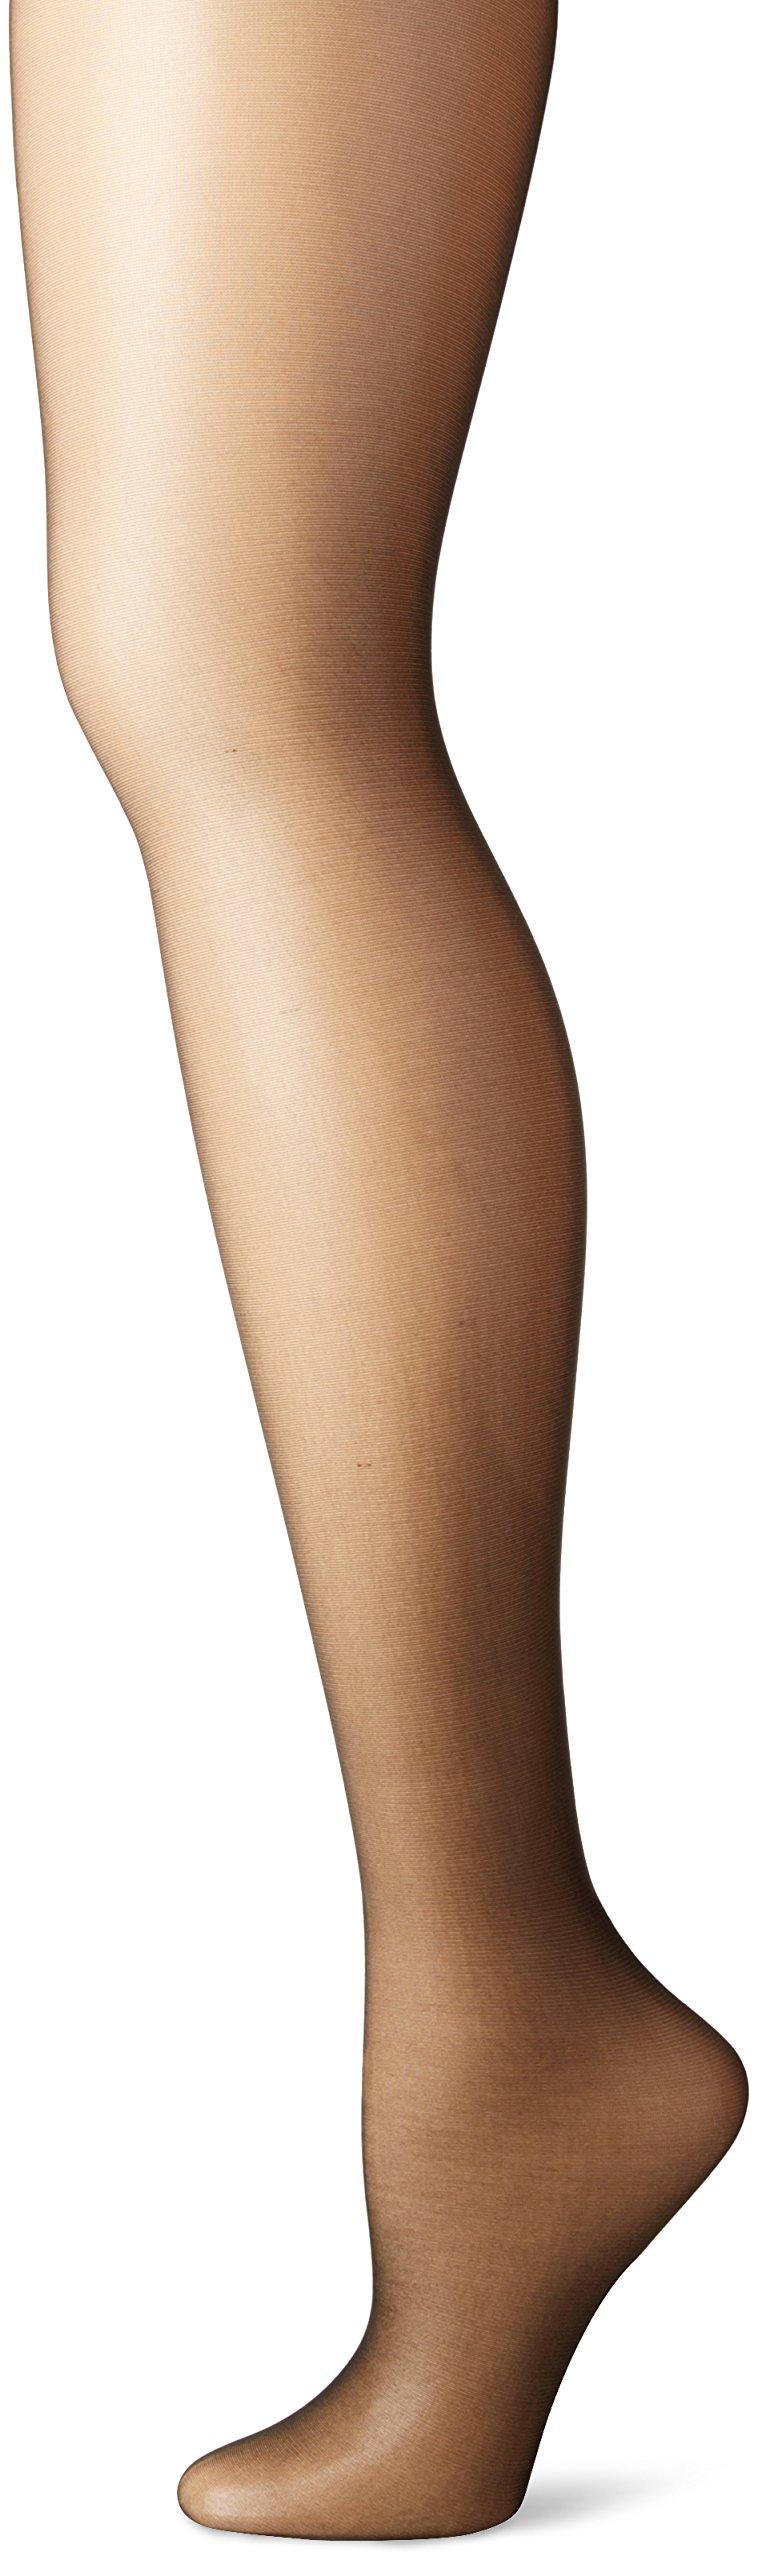 fb20d66a7 Hanes Silk Reflections Women s High Waist Control Top Sandalfoot Pantyhose